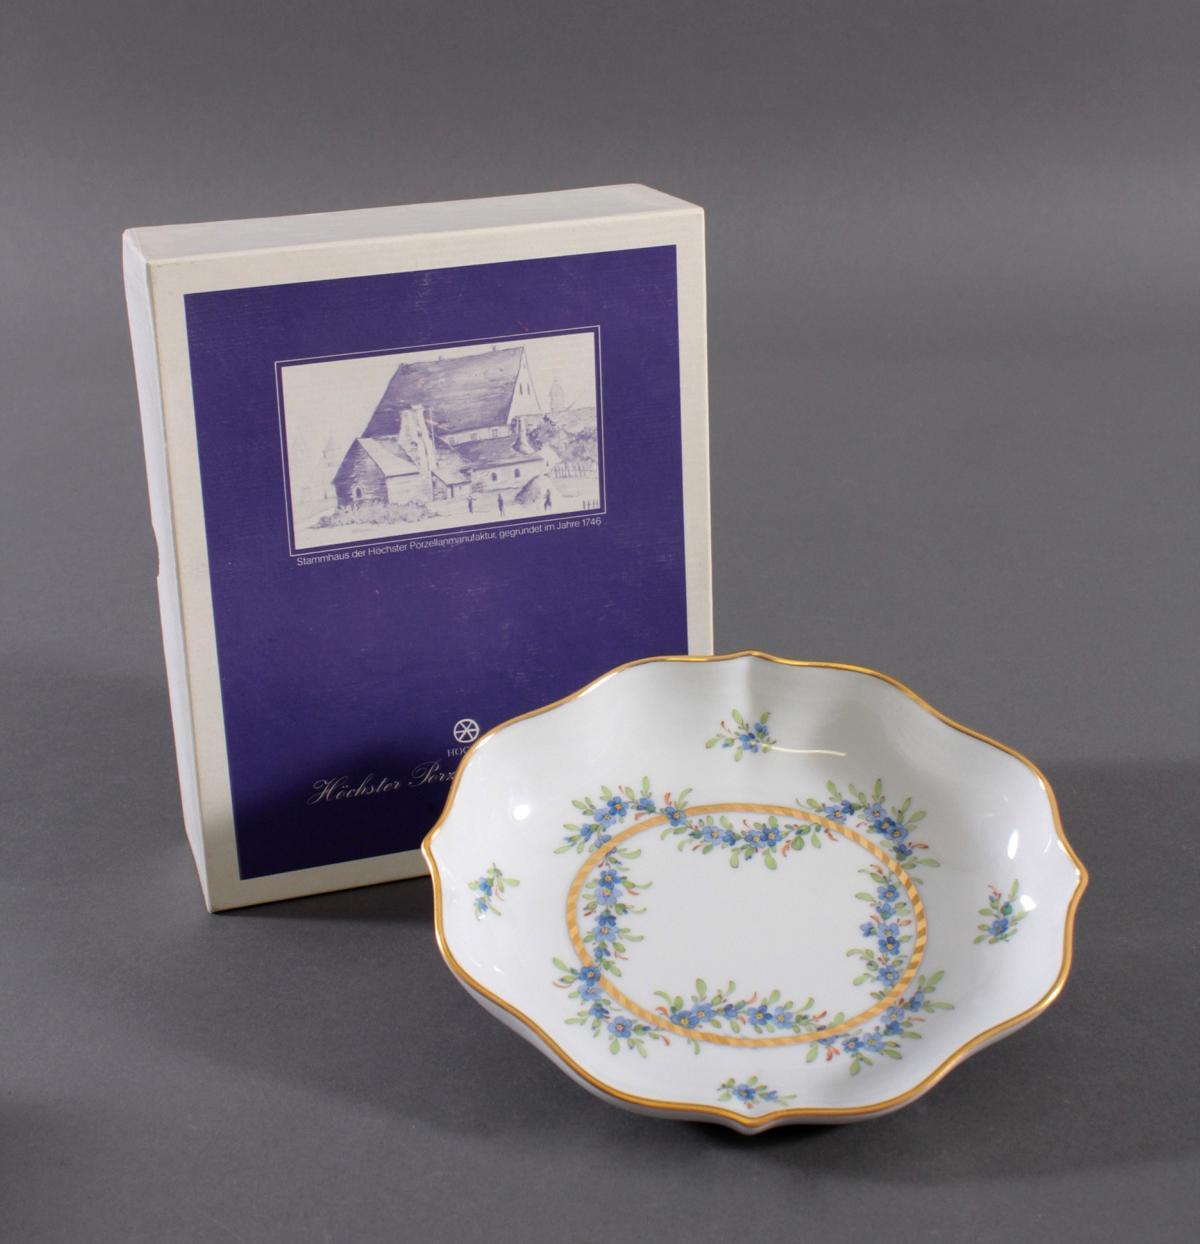 Anbietschale Höchster Porzellanmanufaktur, signiert Kurt Schröder (1927 – 2008)-4